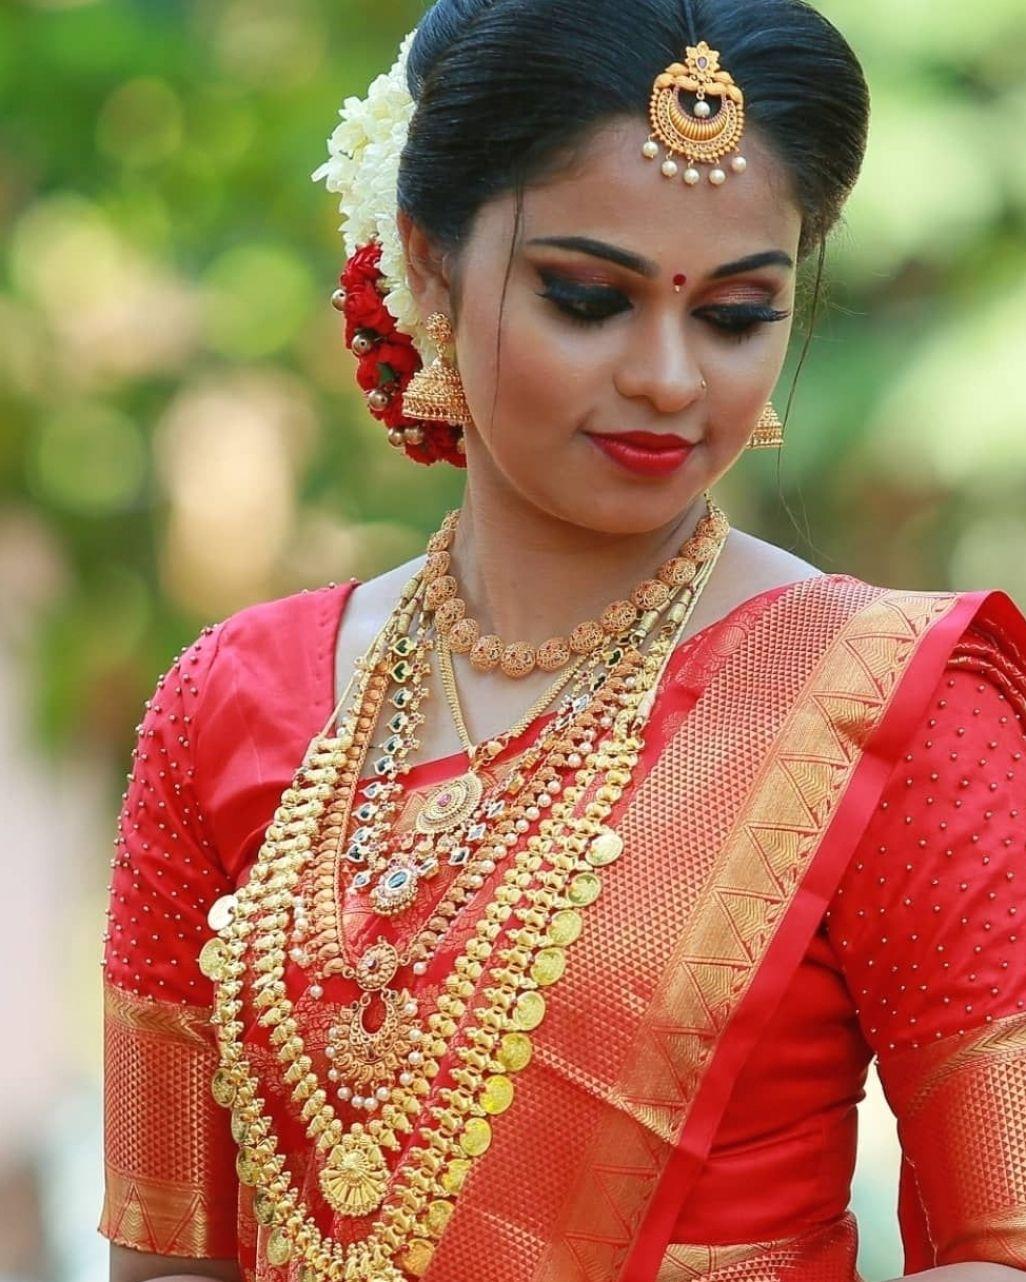 Kerala Bridal Hairstyles For Short Hair Hindu Wedding In 2021 Indian Bridal Hairstyles Kerala Bride Bridal Hairstyle Indian Wedding